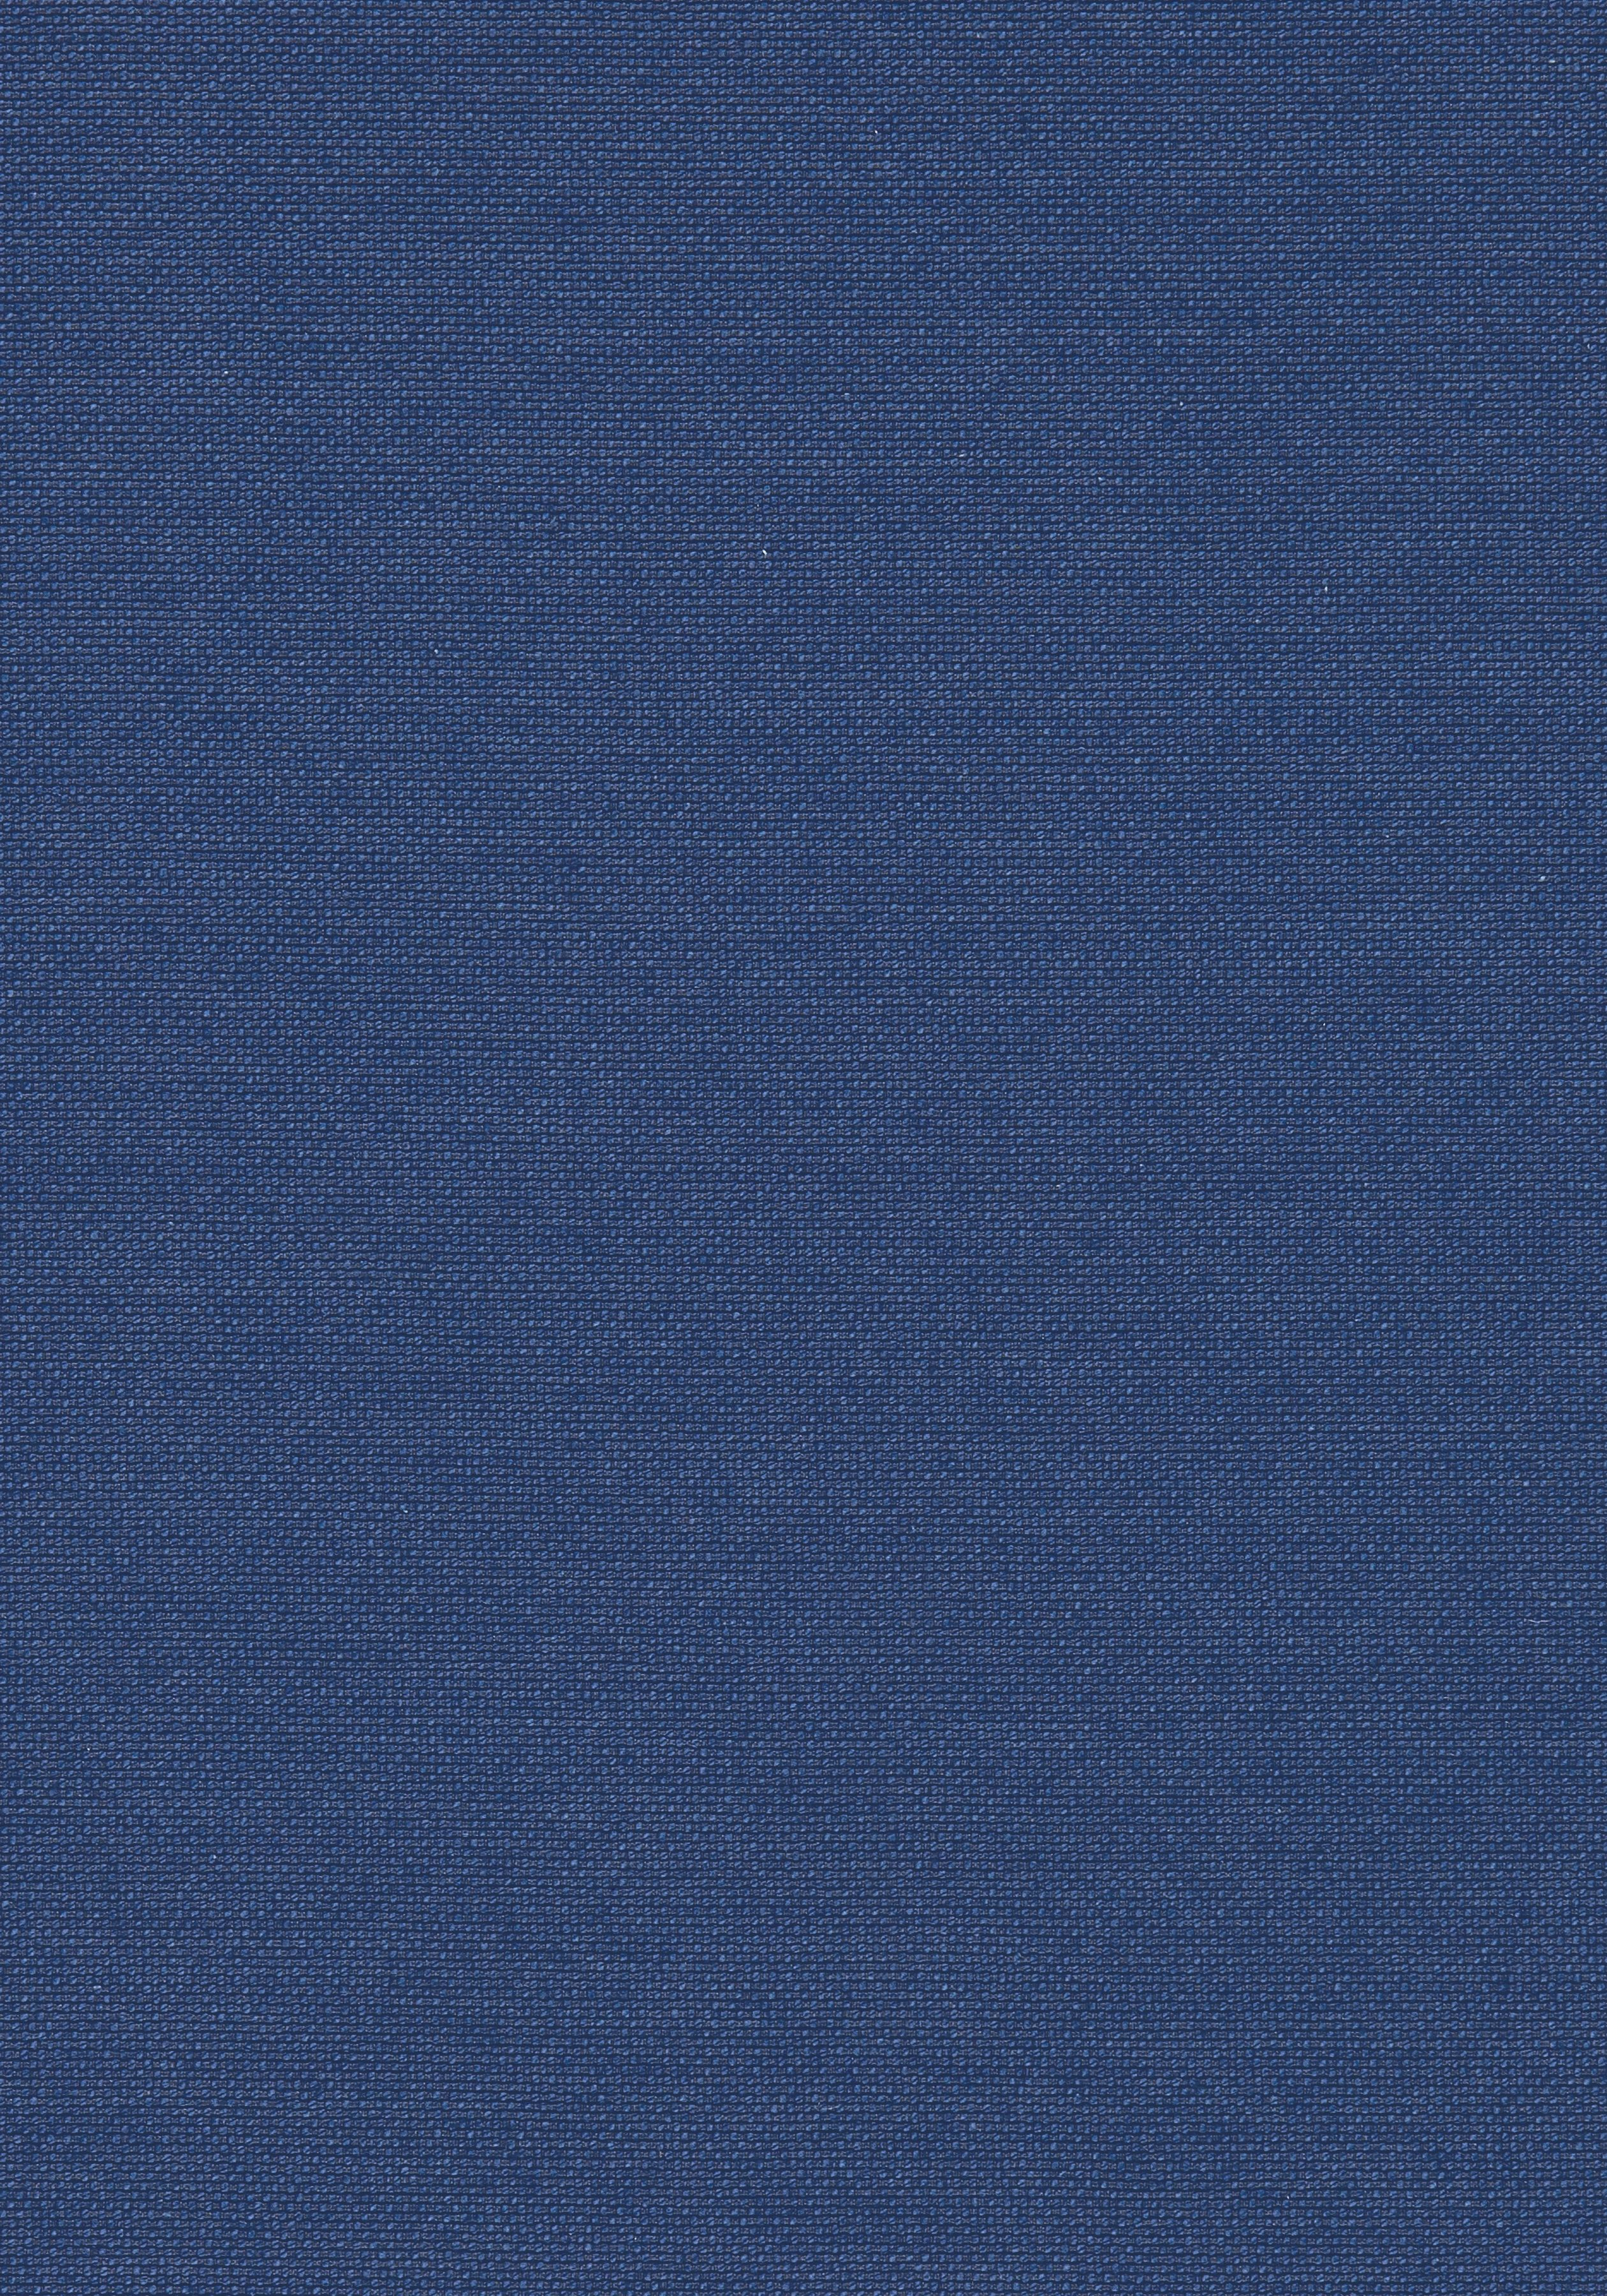 W80269 Royal Blue Wallpaper Blue Fabric Textured Wallpaper